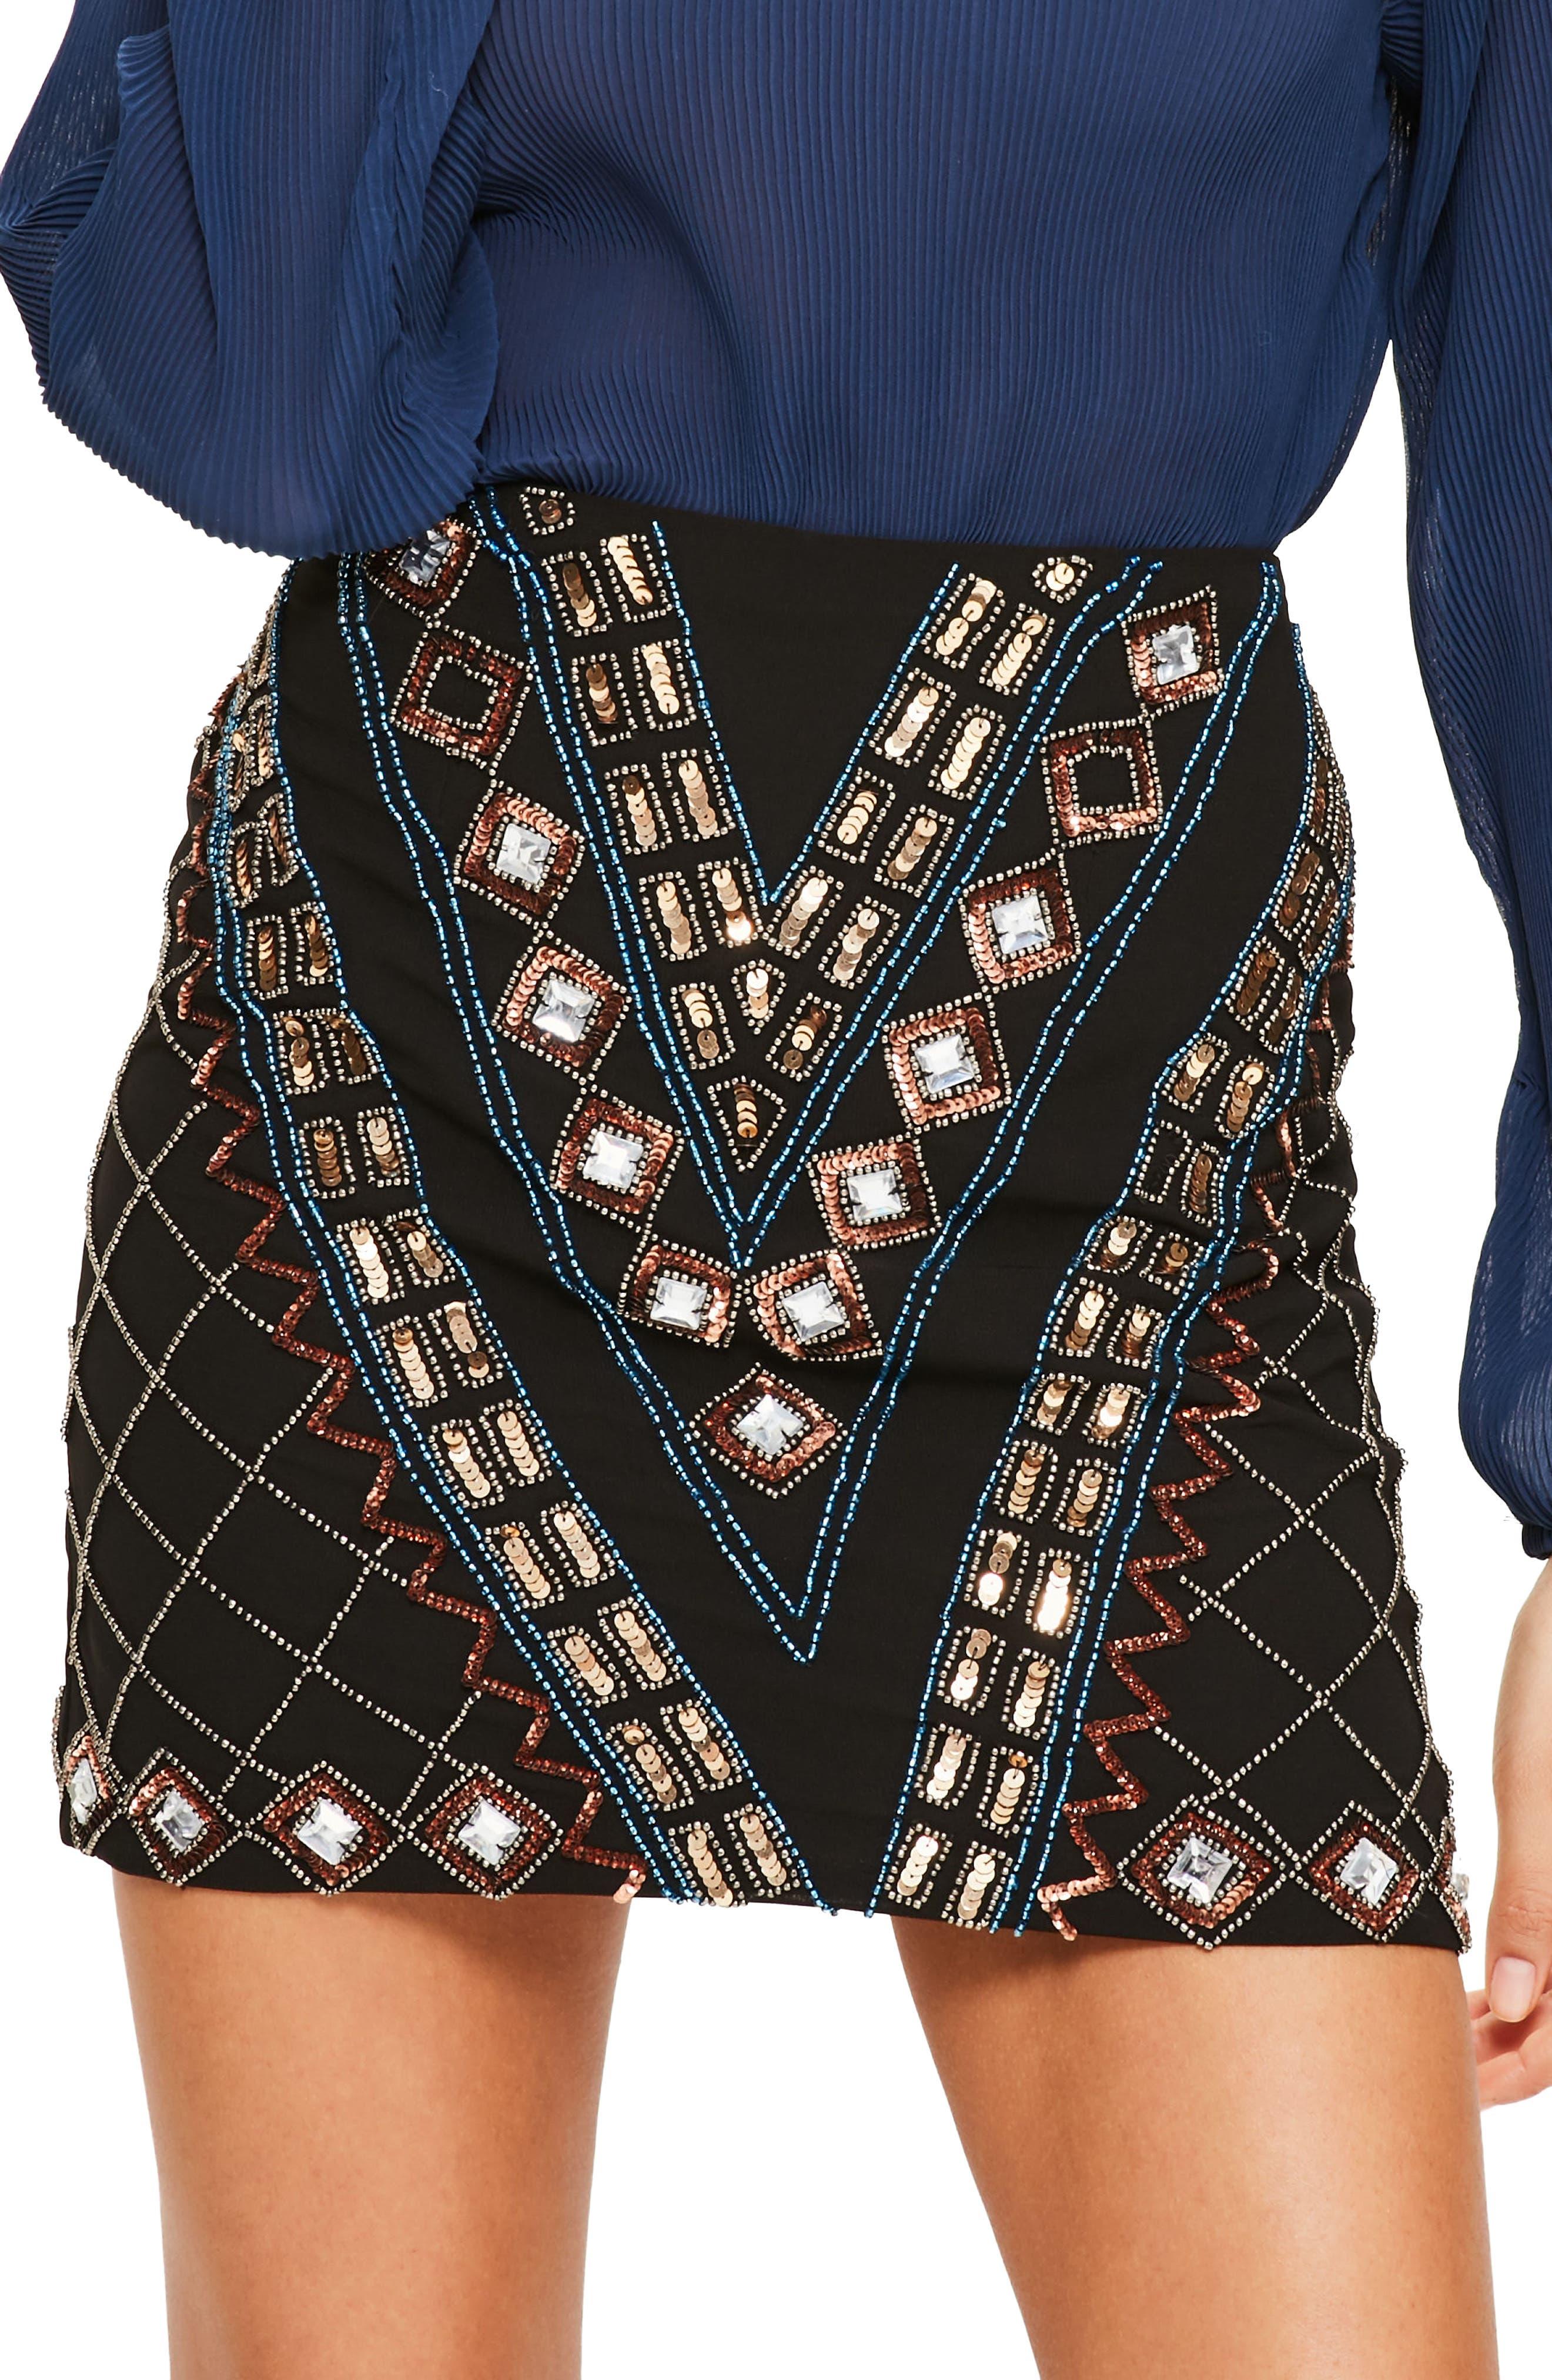 Embellished Miniskirt,                             Main thumbnail 1, color,                             001